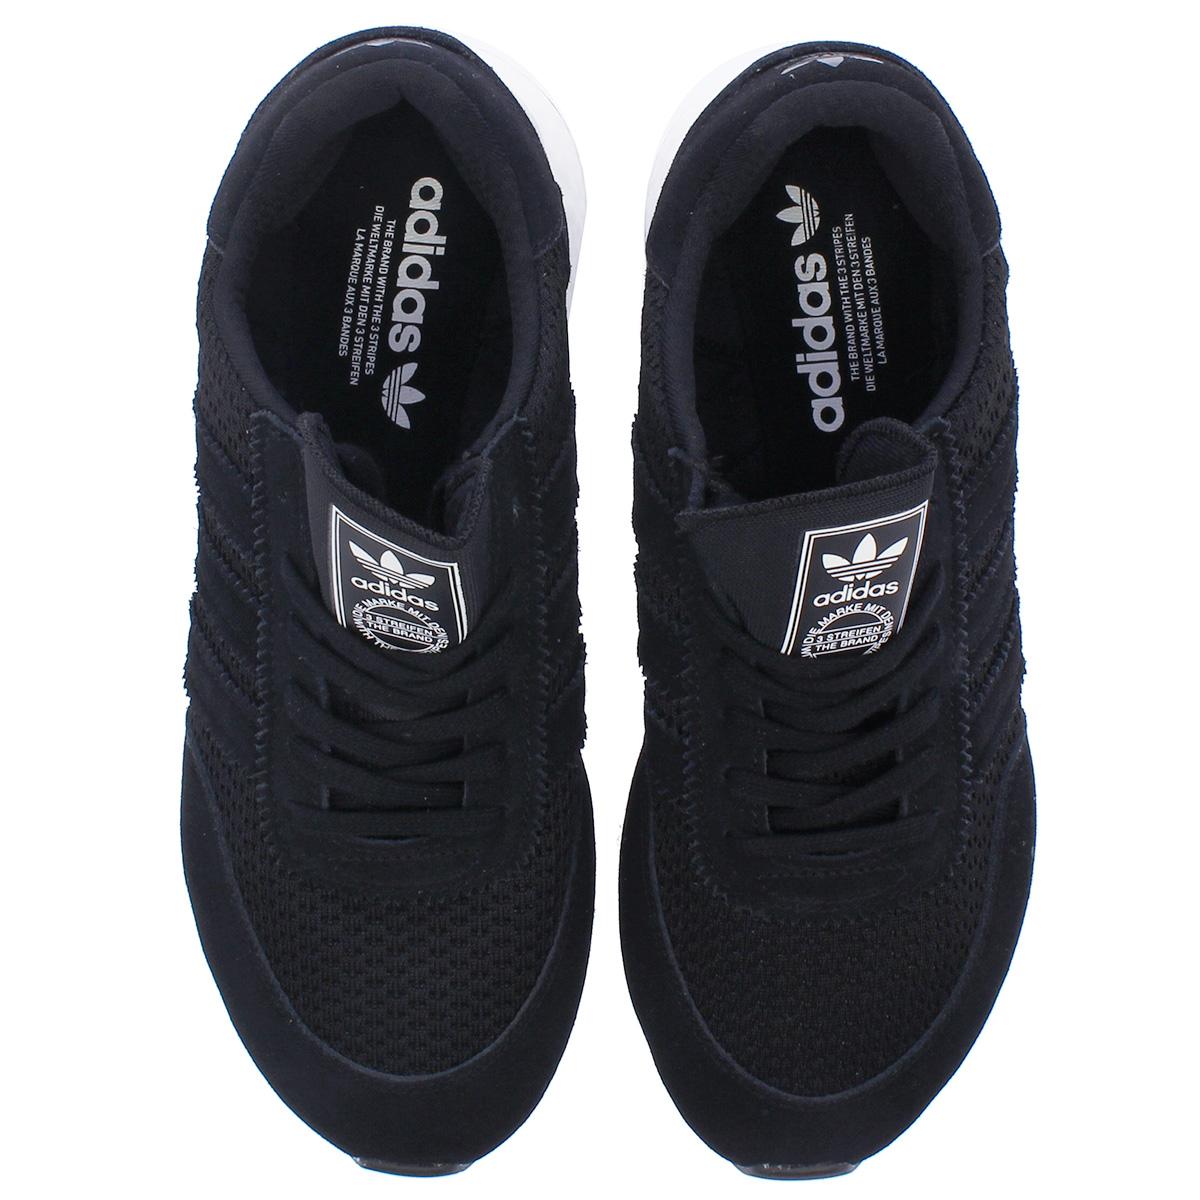 adidas I-5923 INIKIRUNNER Adidas I-5923 イニキランナー CORE BLACK CORE BLACK WHITE  d96608 f0f81da27